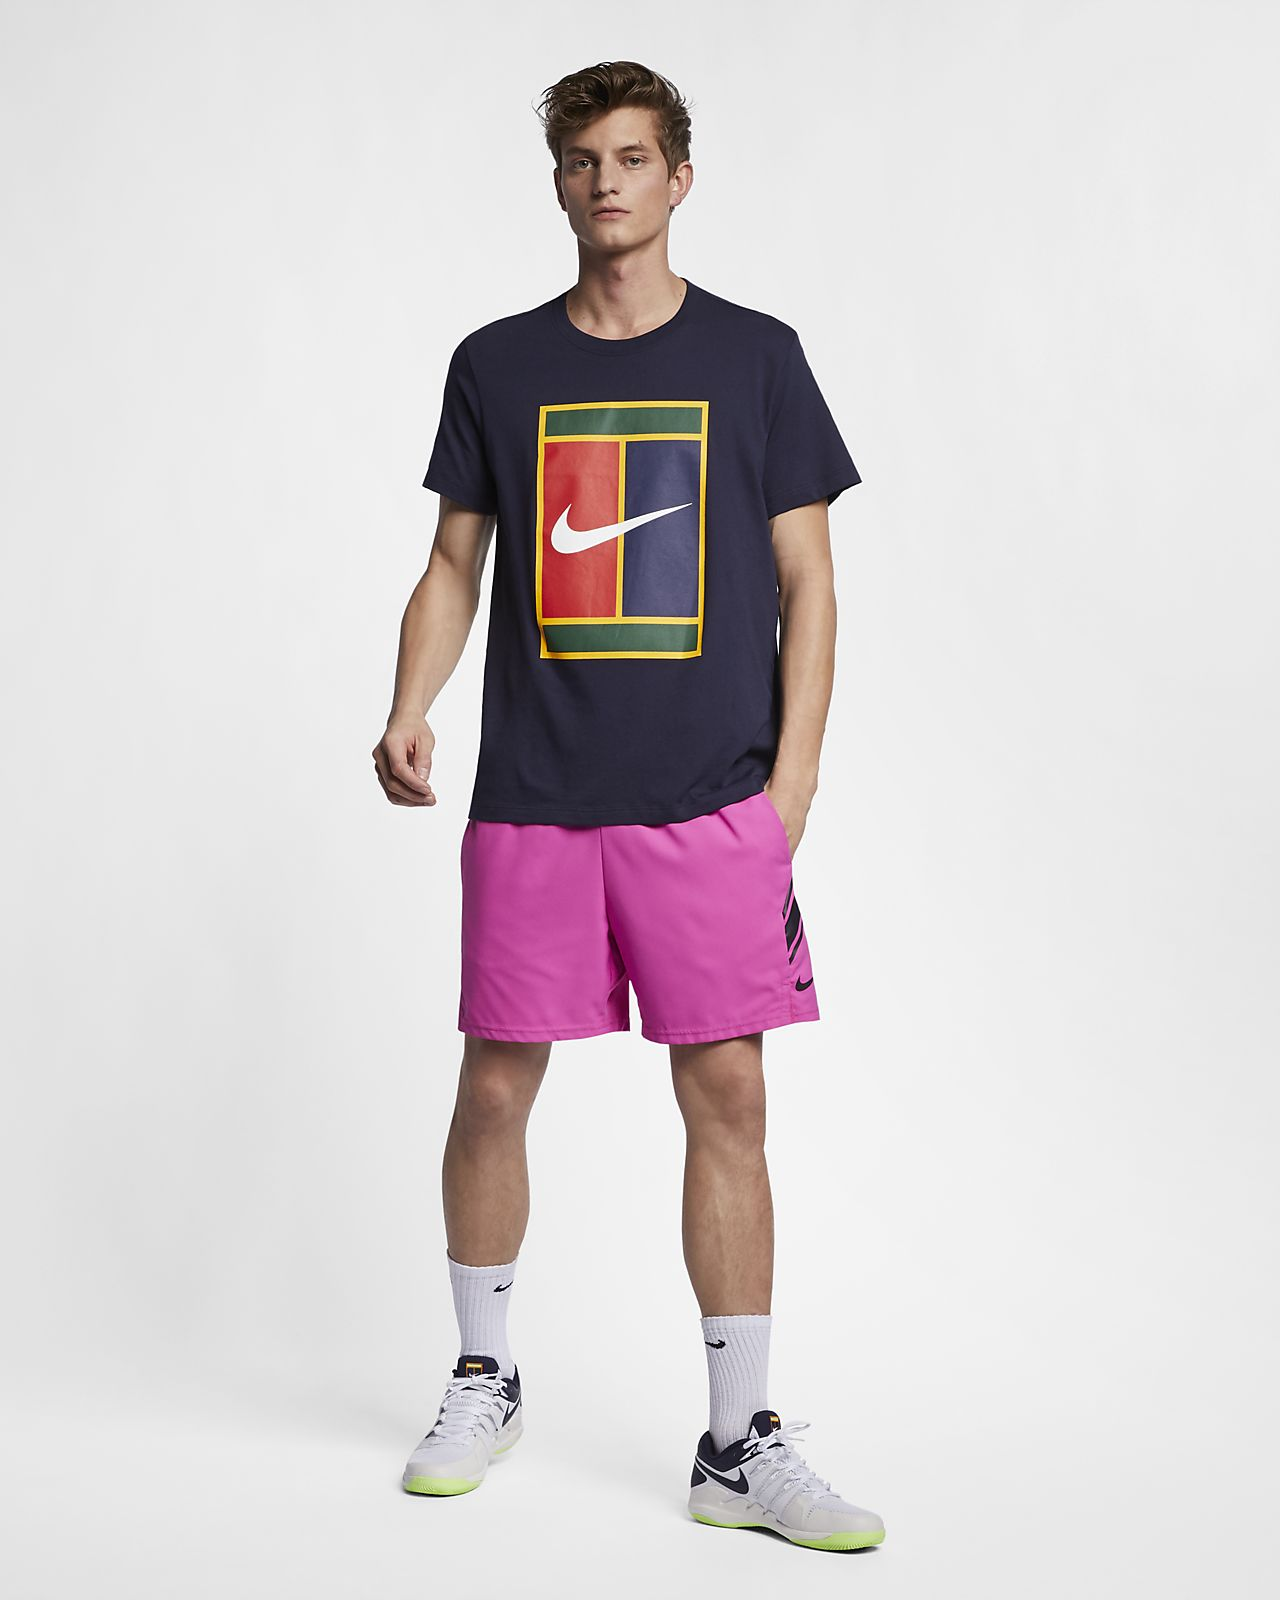 0cf52d3cc0008 NikeCourt Men s Logo Tennis T-Shirt. Nike.com NZ